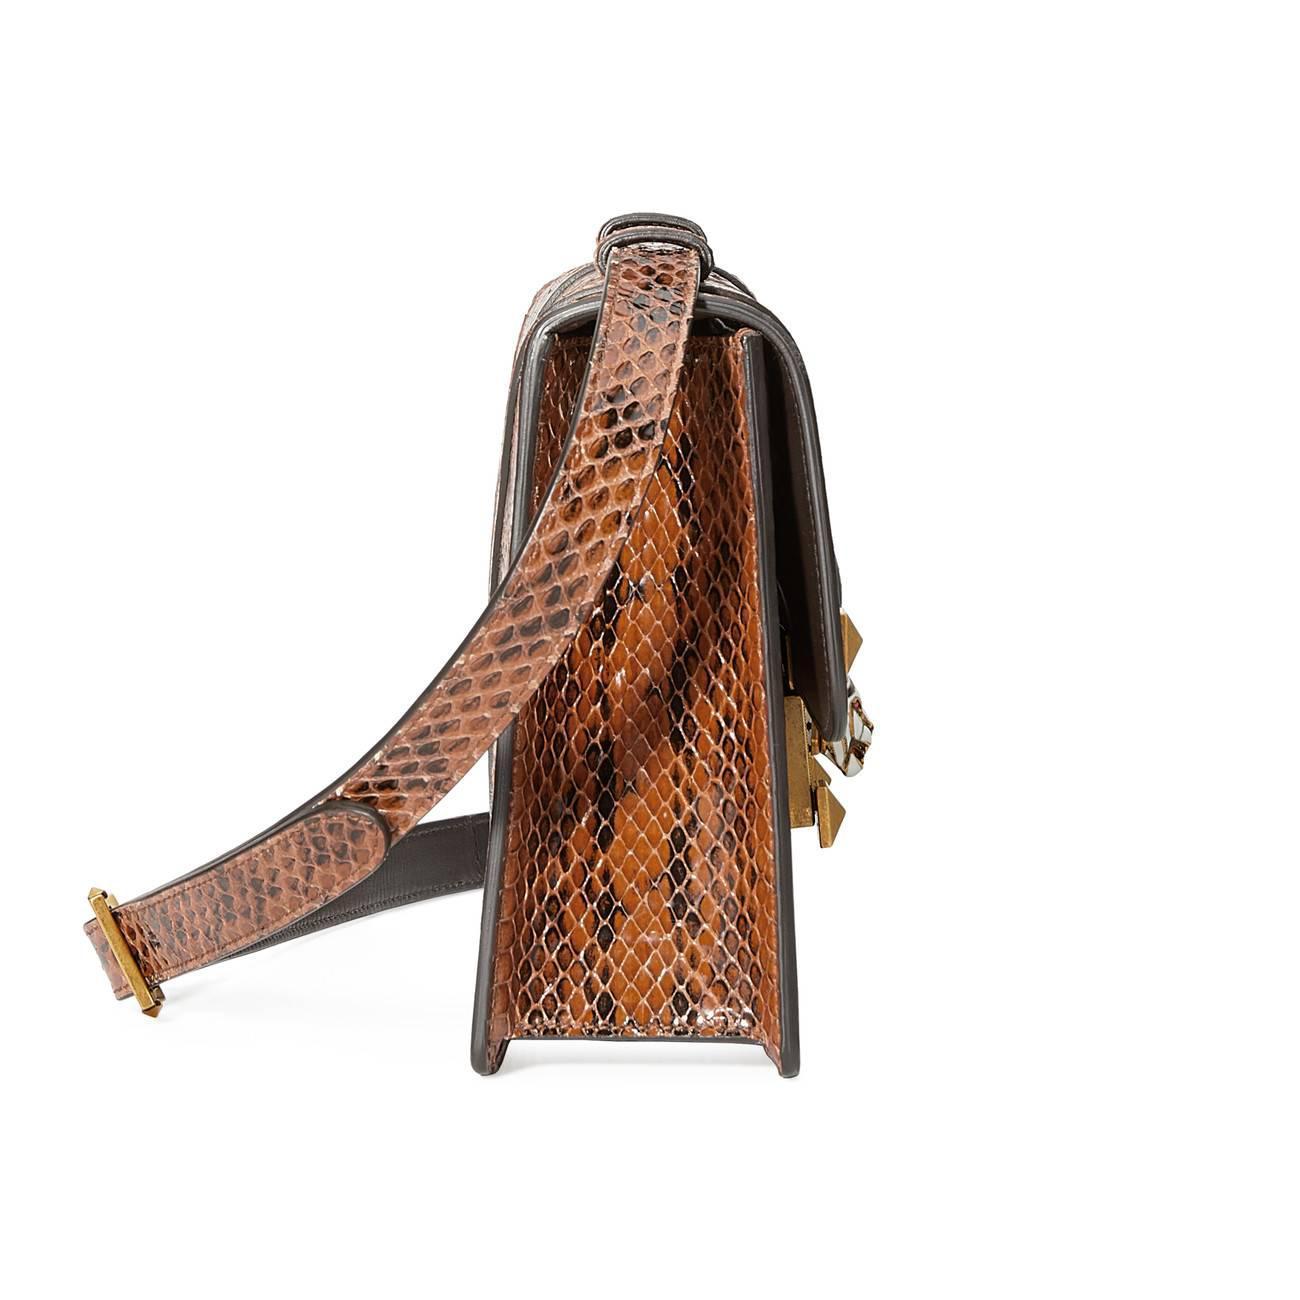 539c54a06f0 Lyst - Gucci Osiride Snakeskin Shoulder Bag in Brown